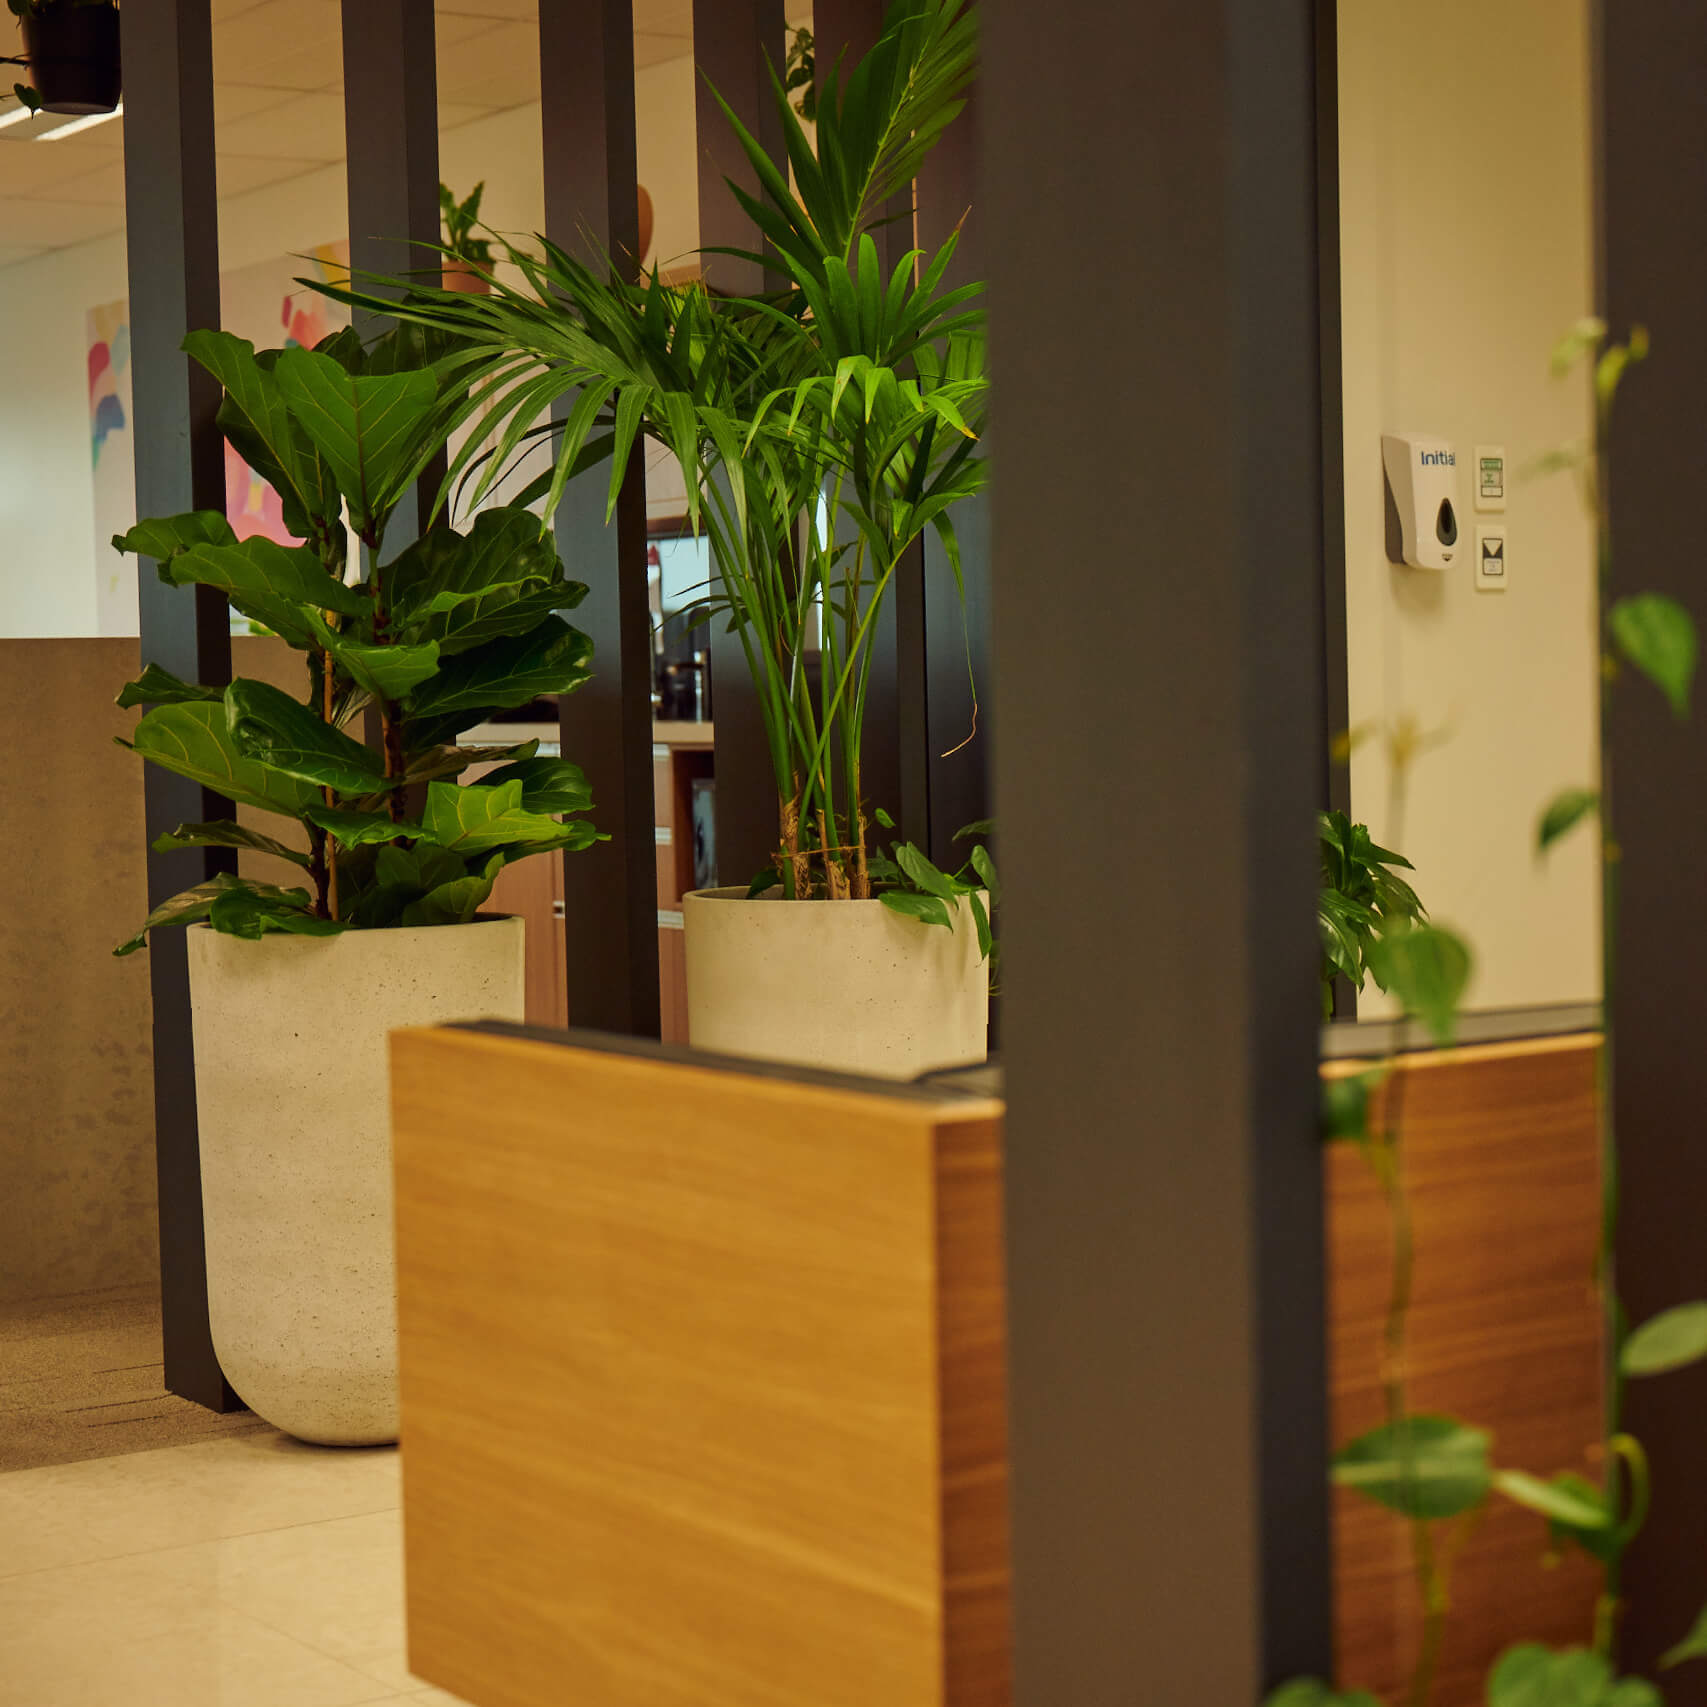 portfolio-offices-spaces-martinjenkins-image3